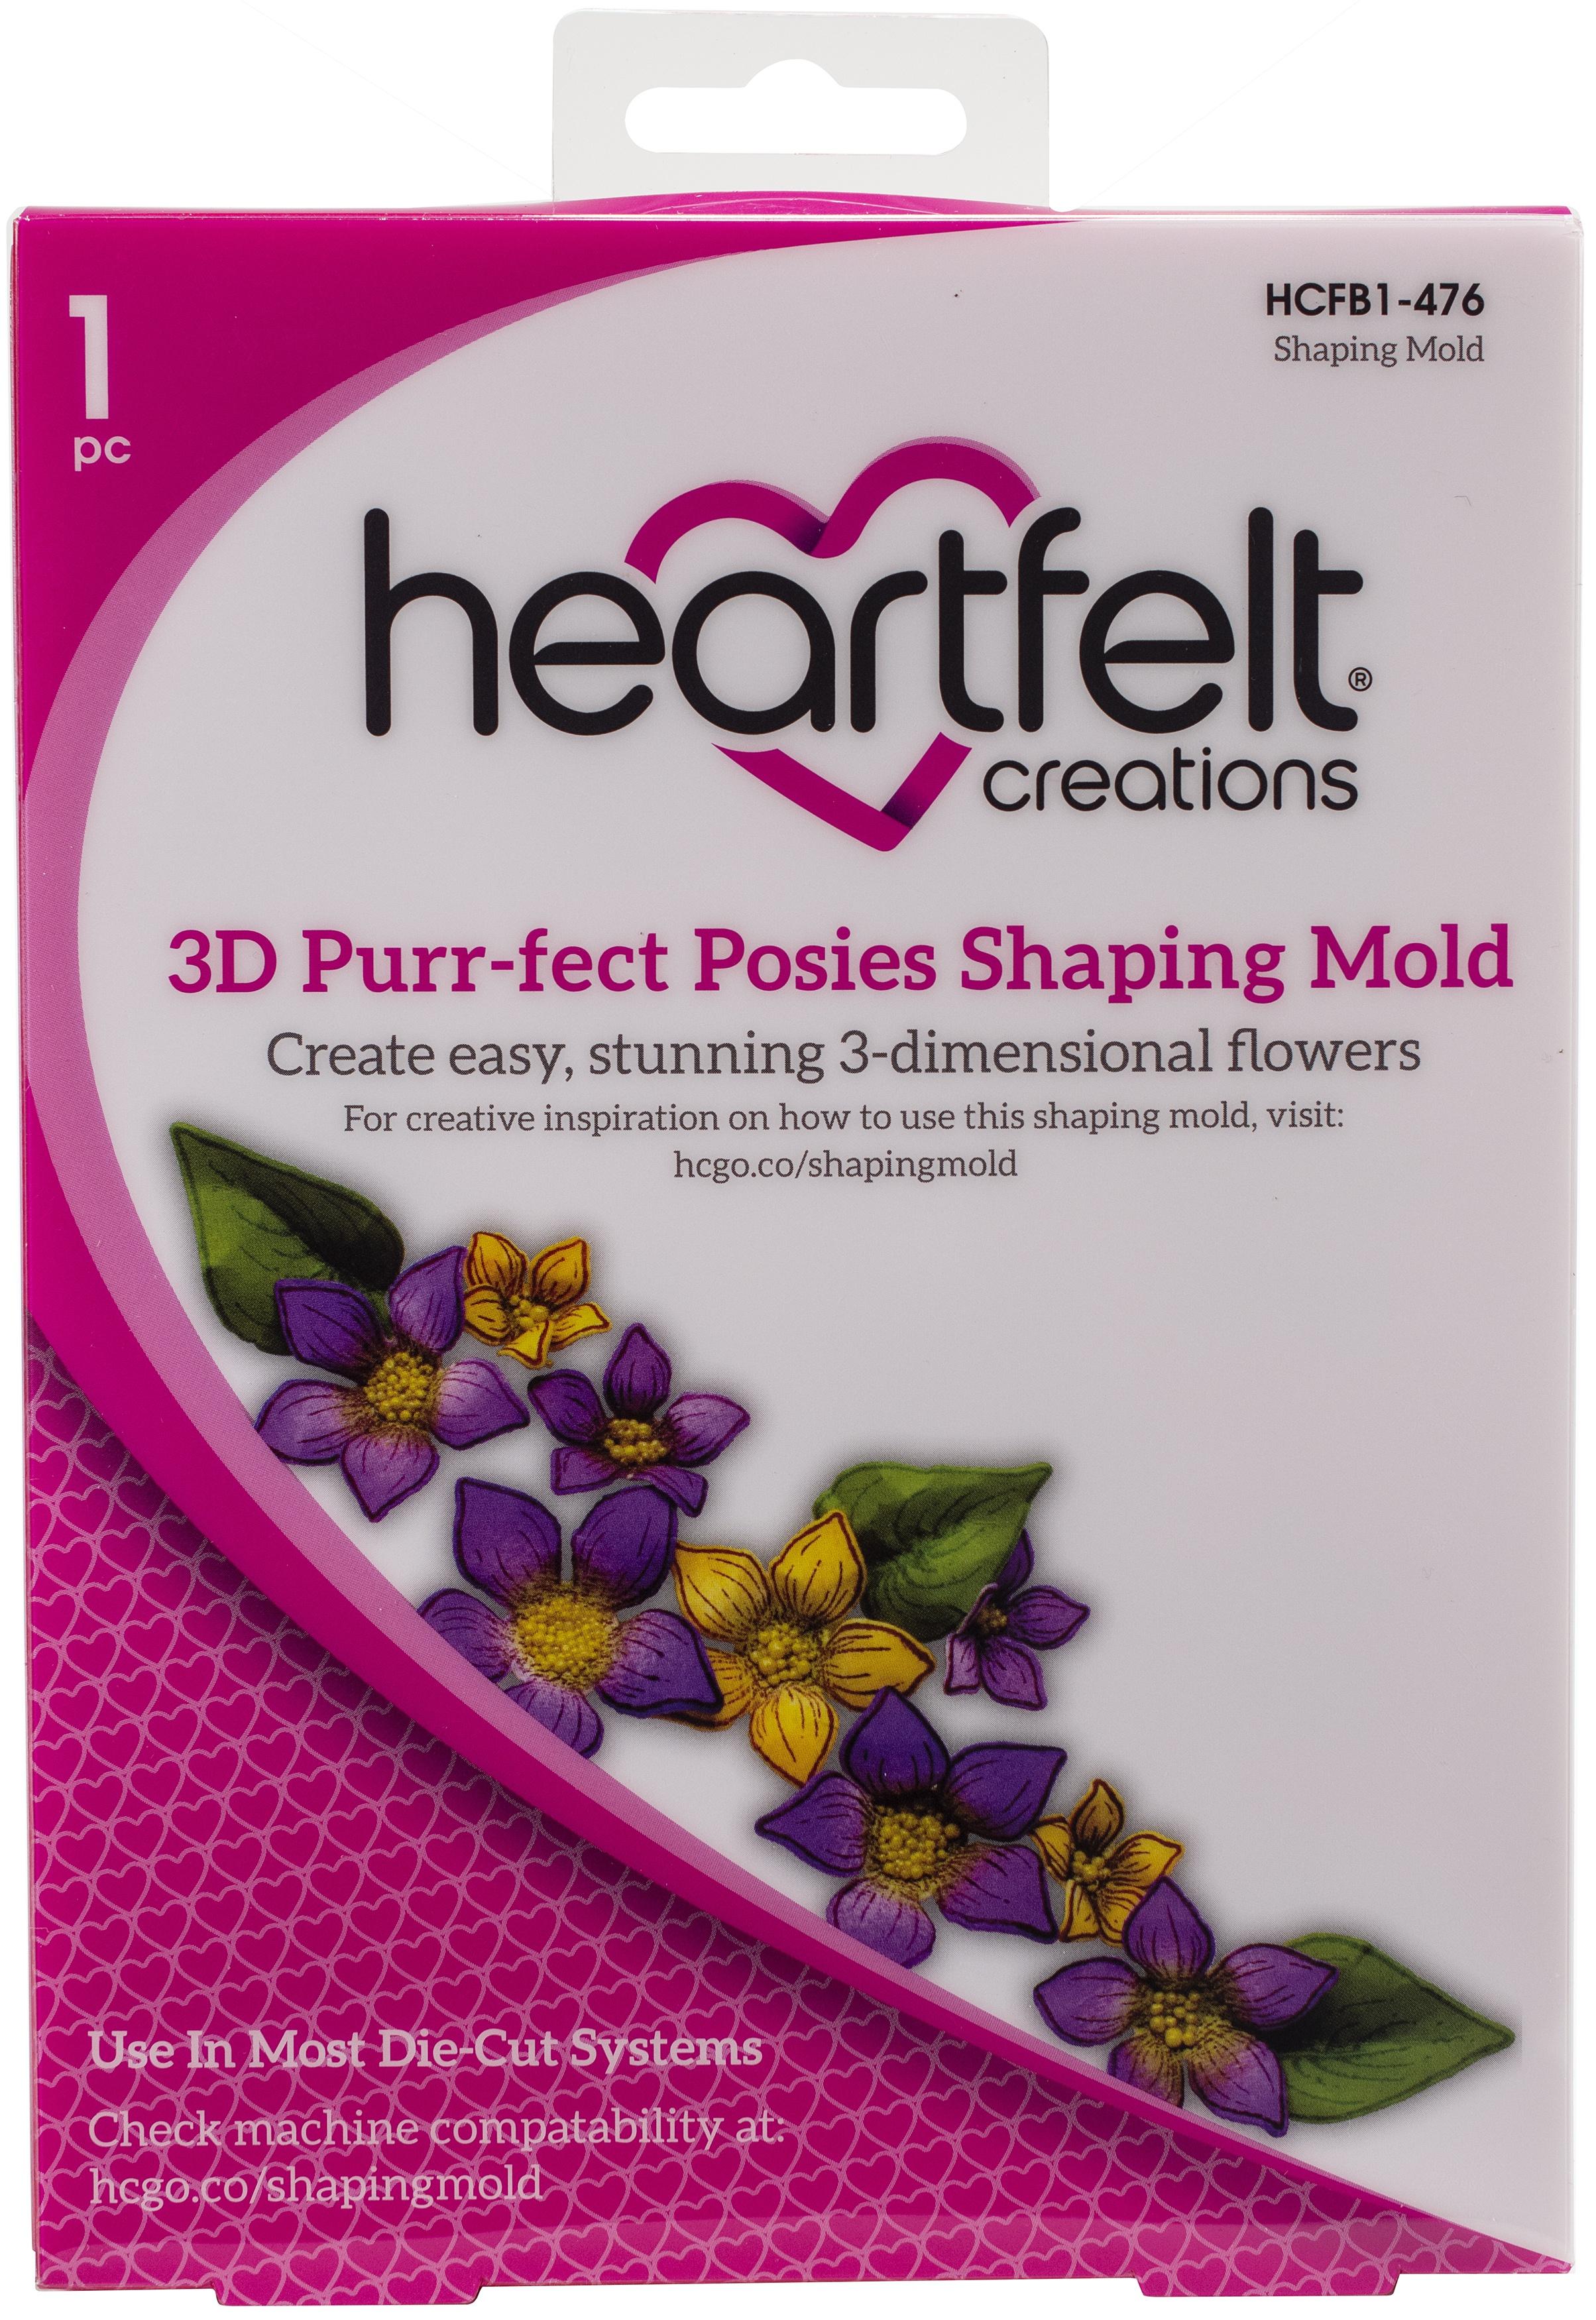 Heartfelt Creations 3D Purr-fect Posies Shaping Mold